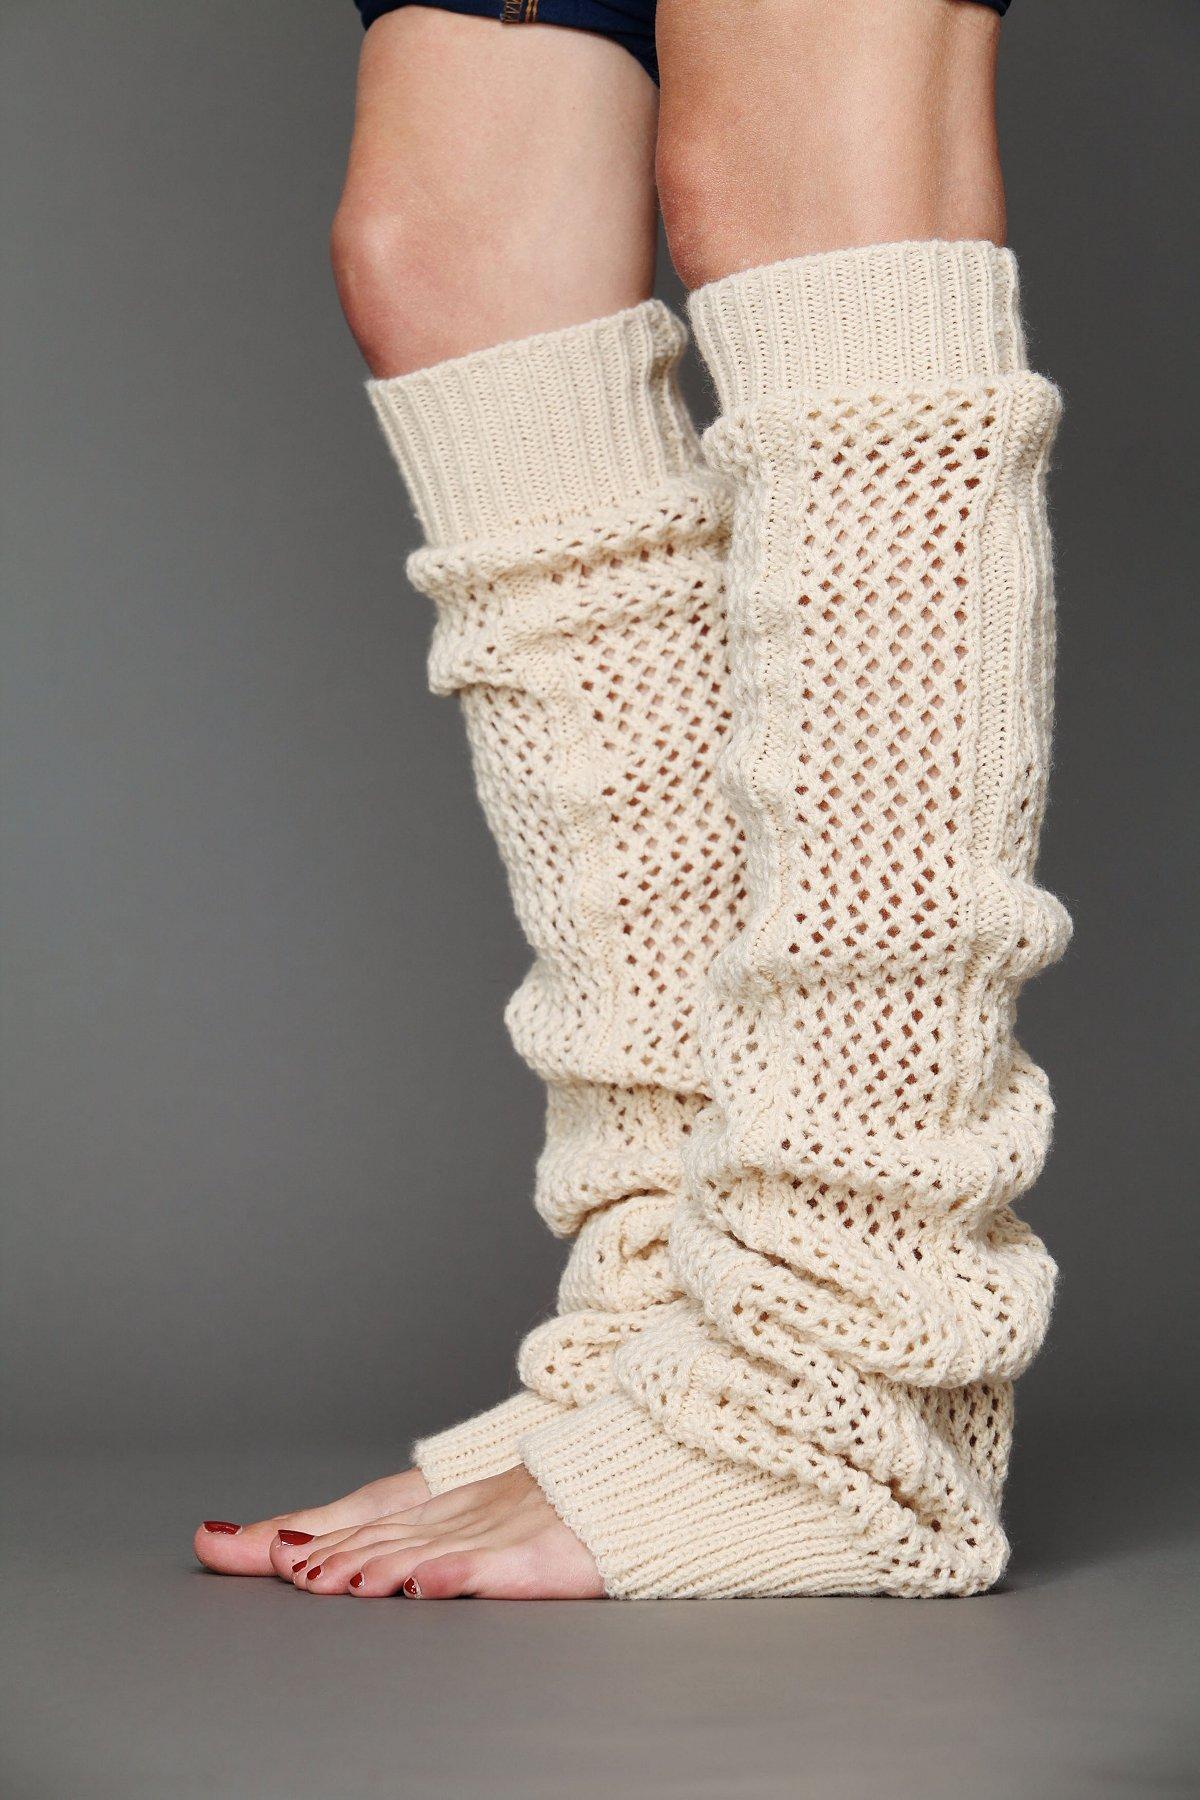 Thigh High Crochet Legwarmer